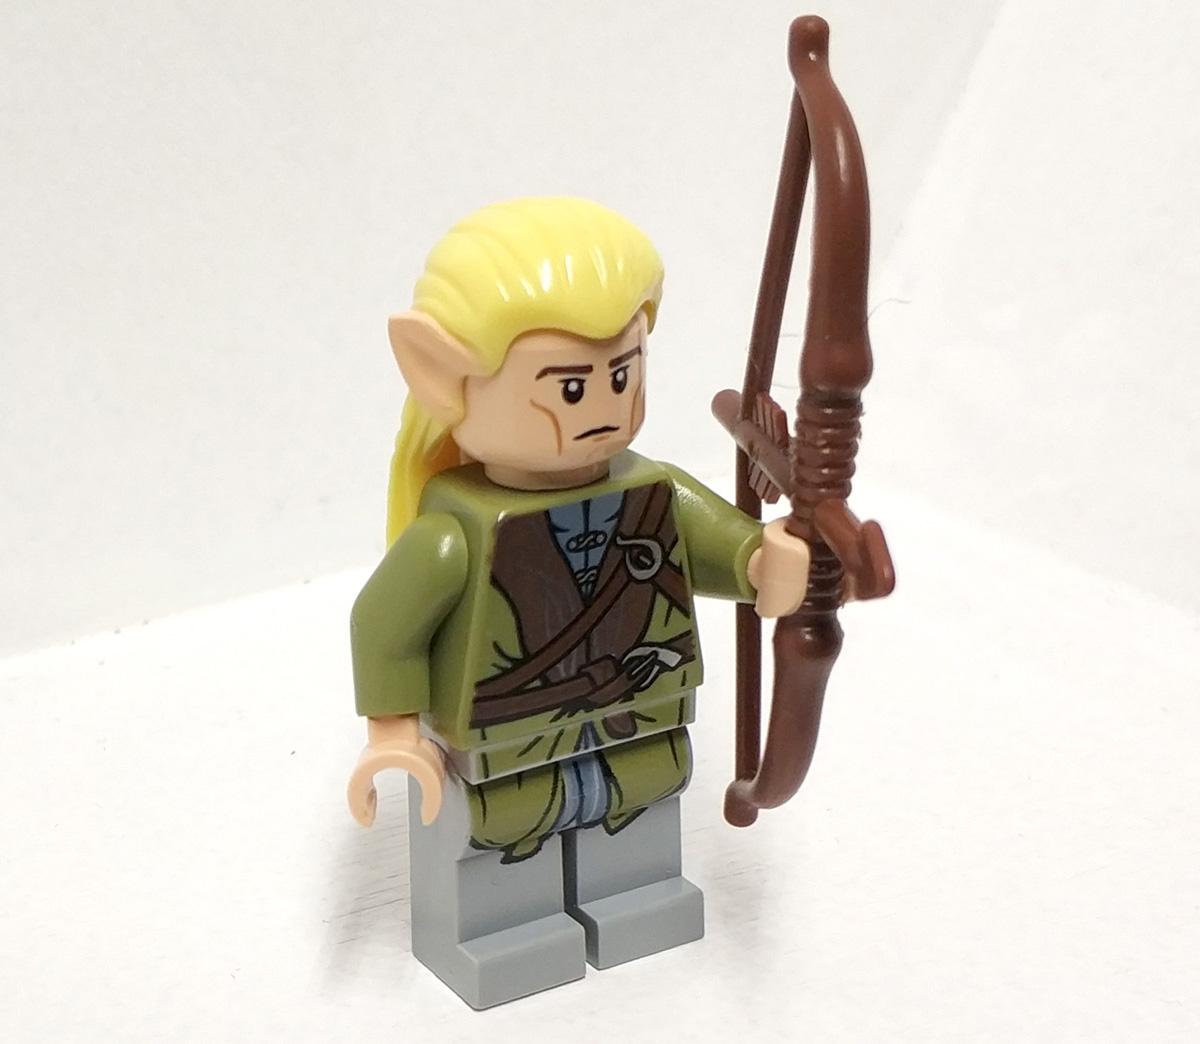 Lego Figurka Lor015 Legolas Lotr Władca Pierścieni 7132293518